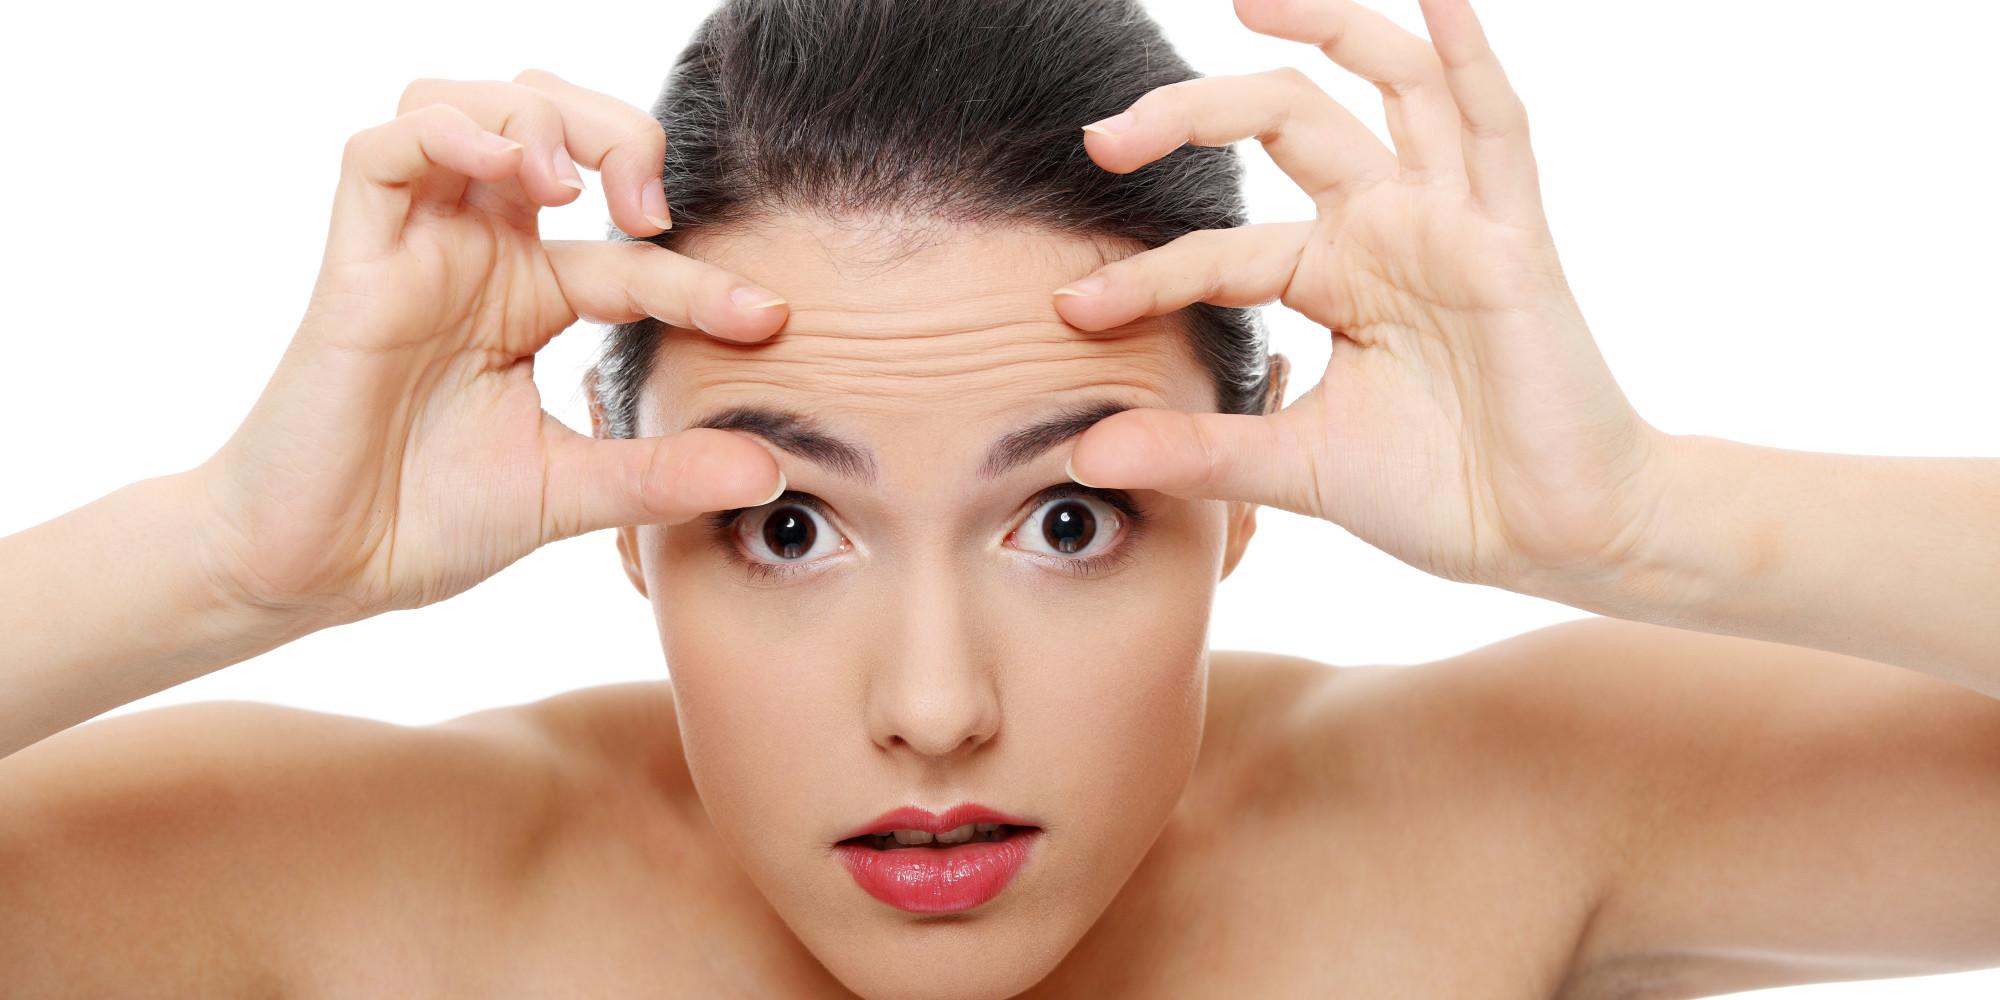 9 Useful Ways To Reduce Wrinkles